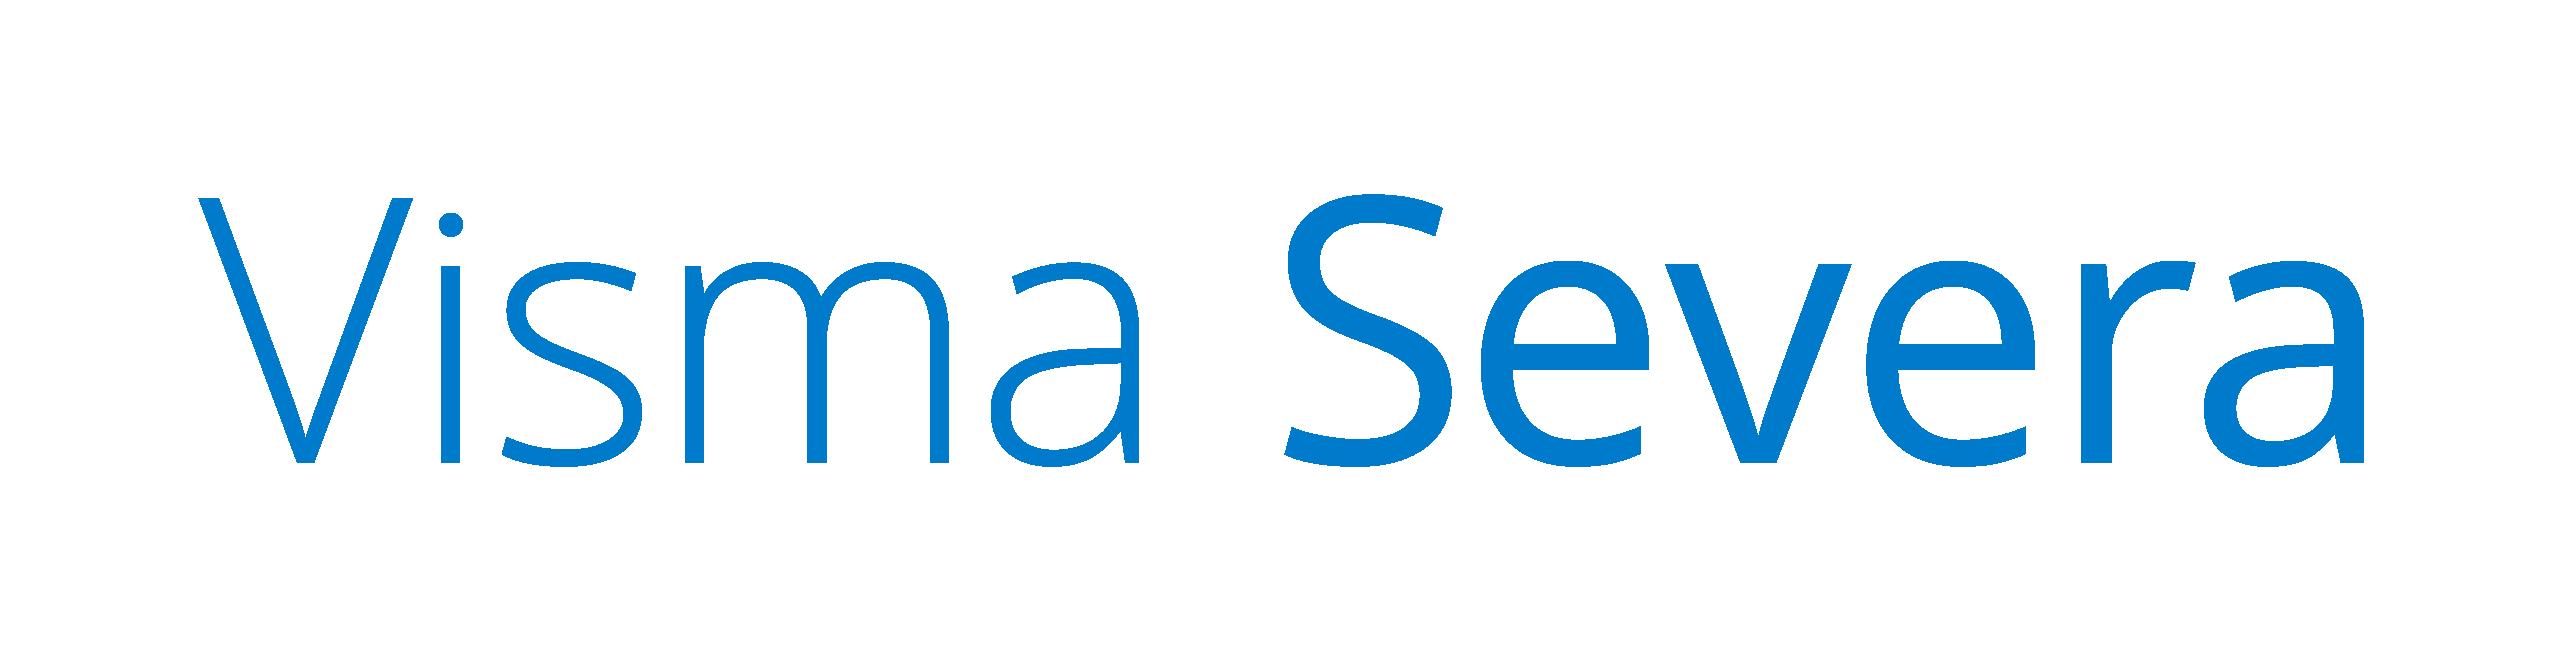 Visma Severa integration with Silverbucket